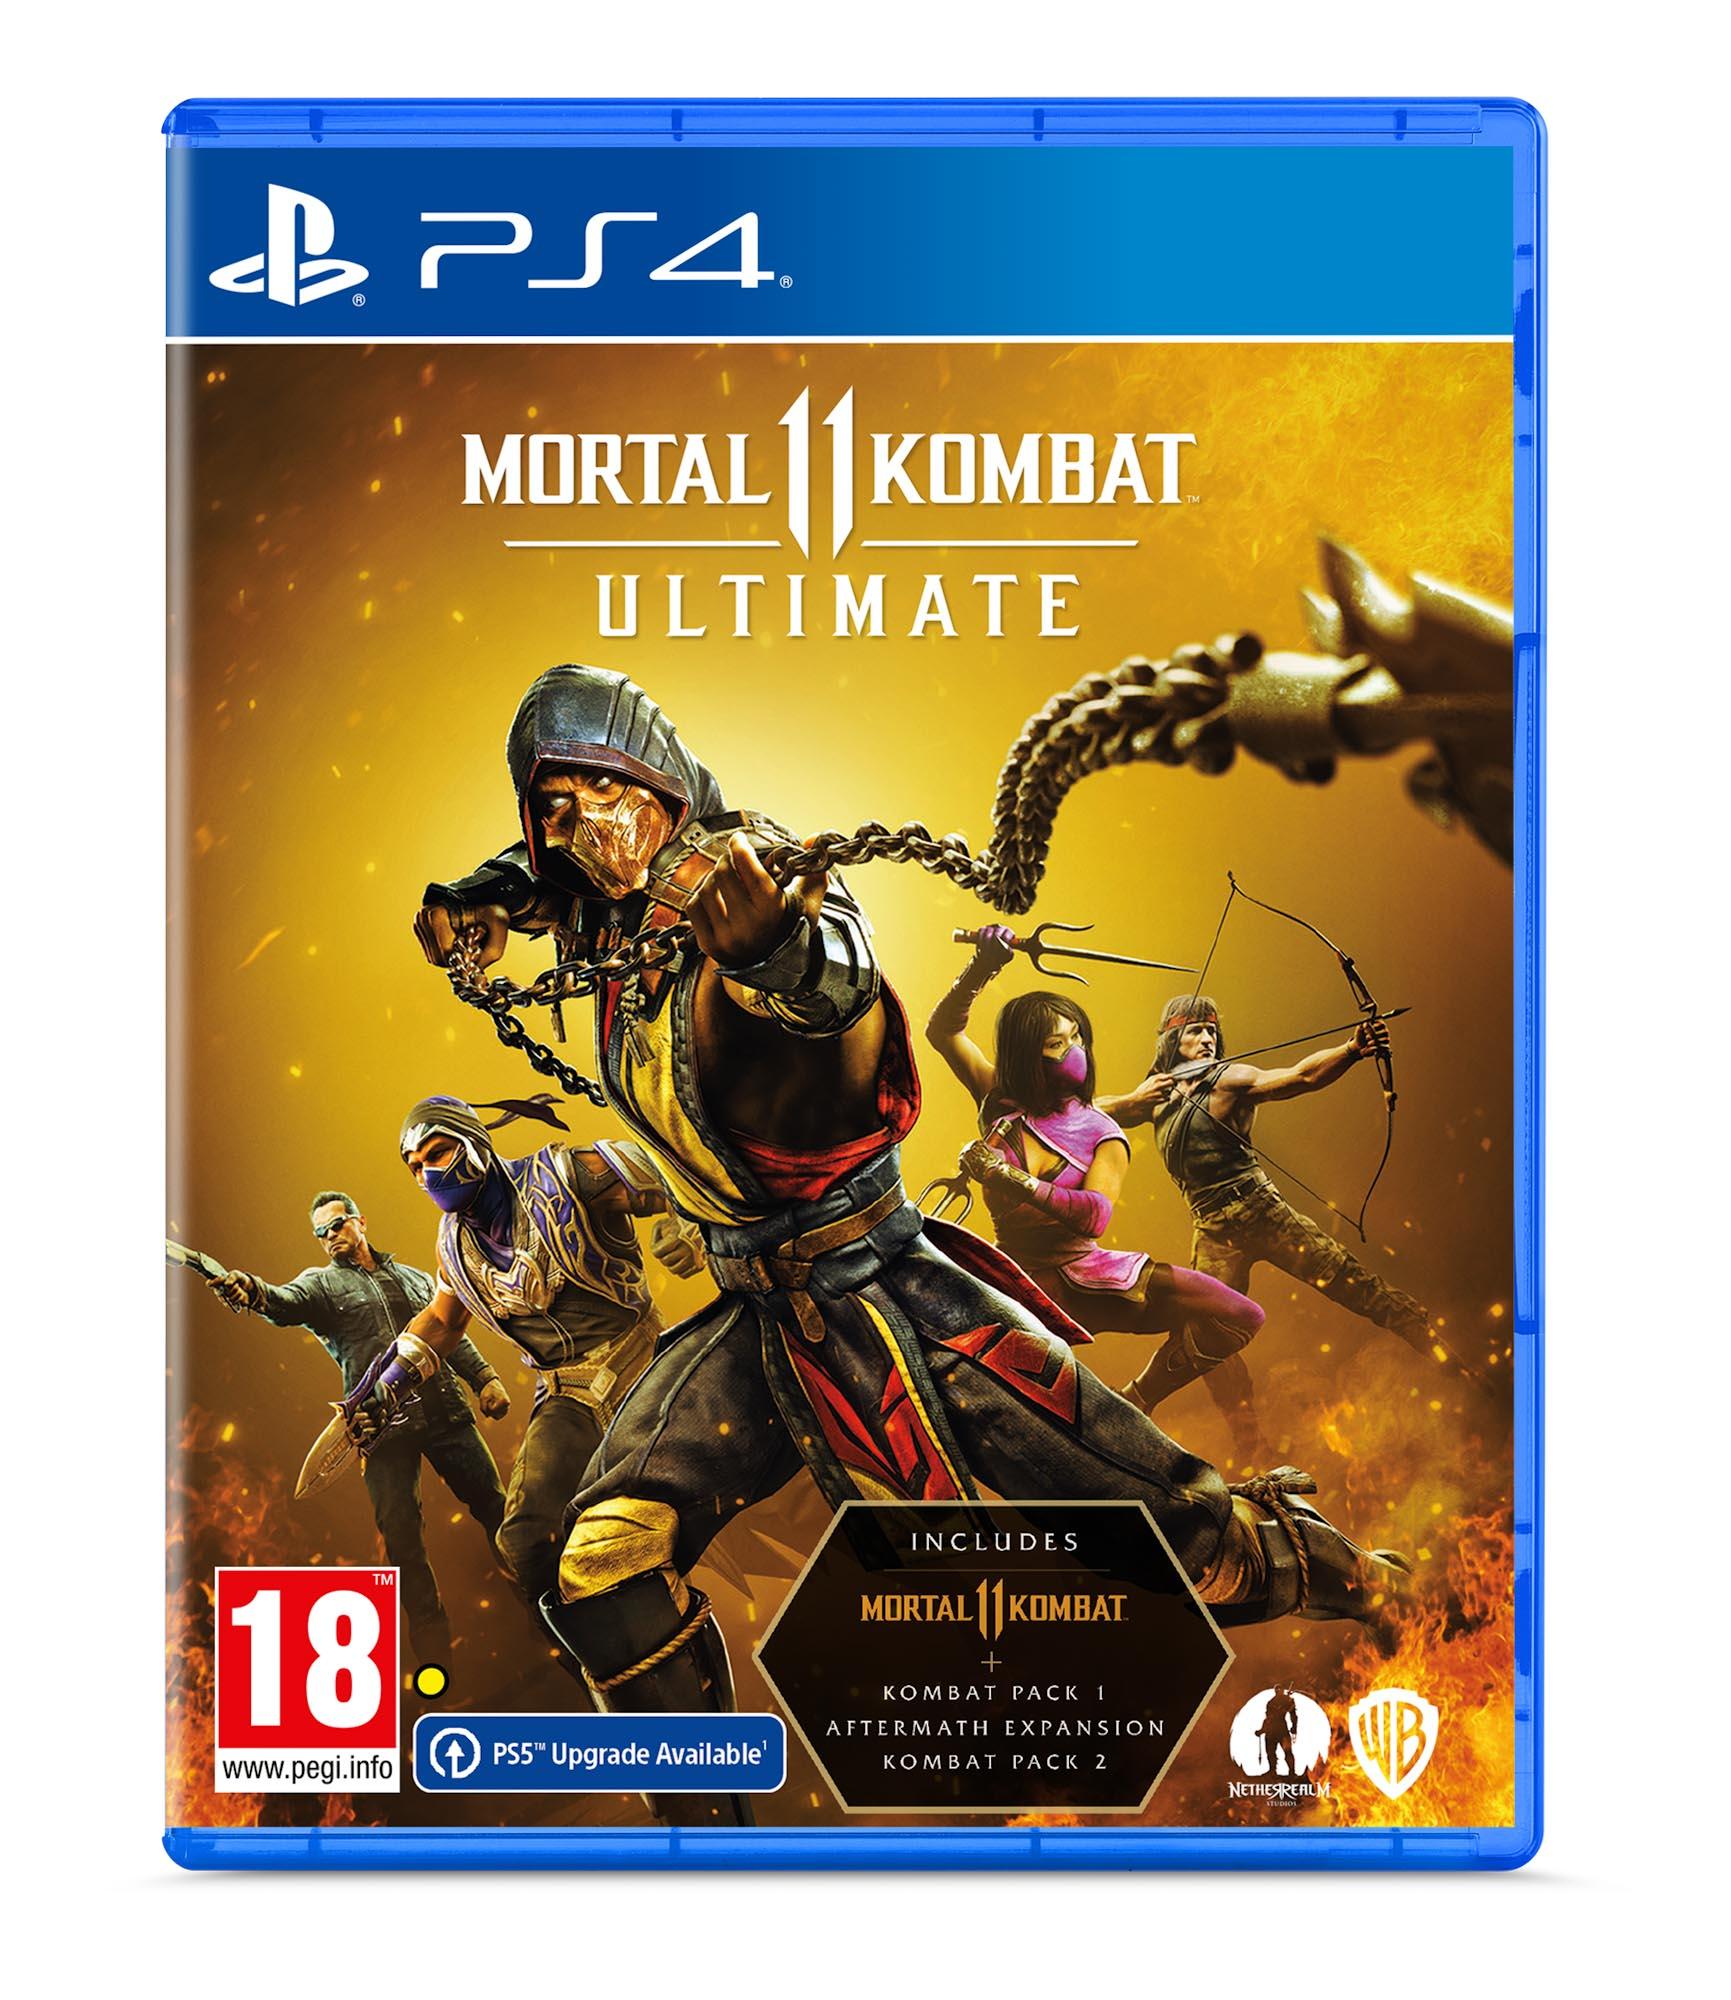 Mortal Kombat 11 Ultimate Edition PS4 - Warner 1.12.74.21.018